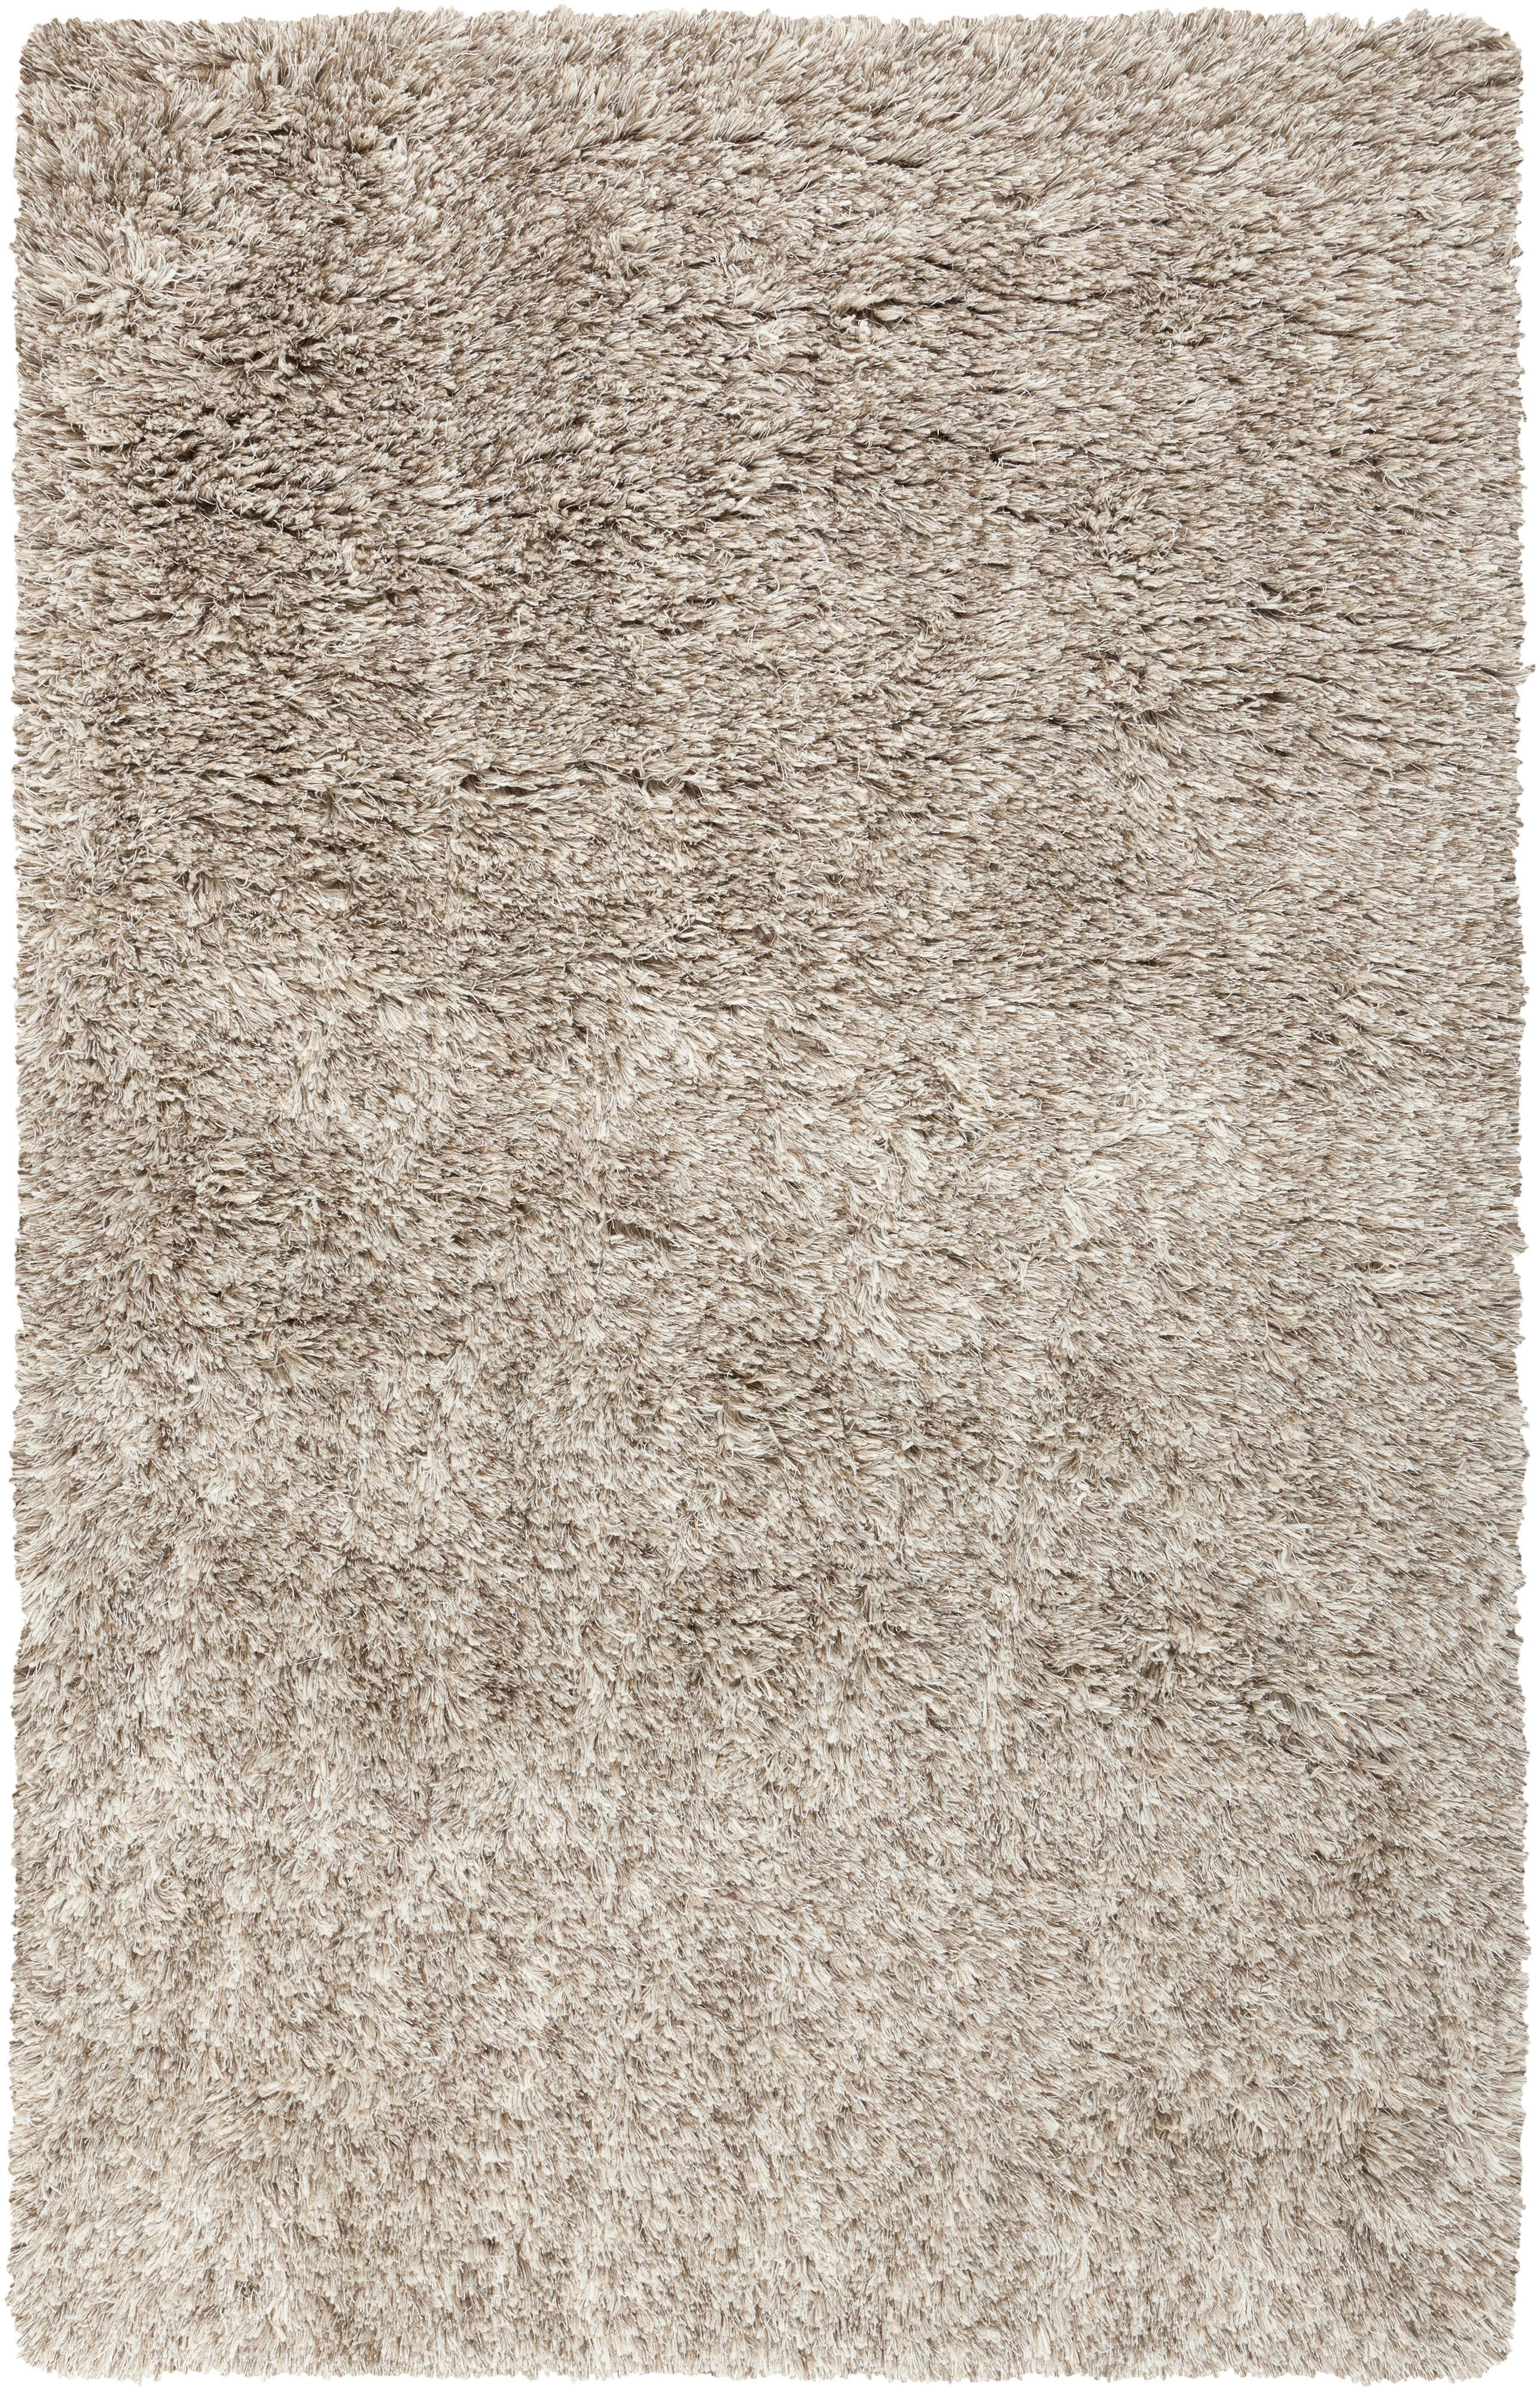 Surya Rugs Milan 9' x 13' - Item Number: MIL5001-913